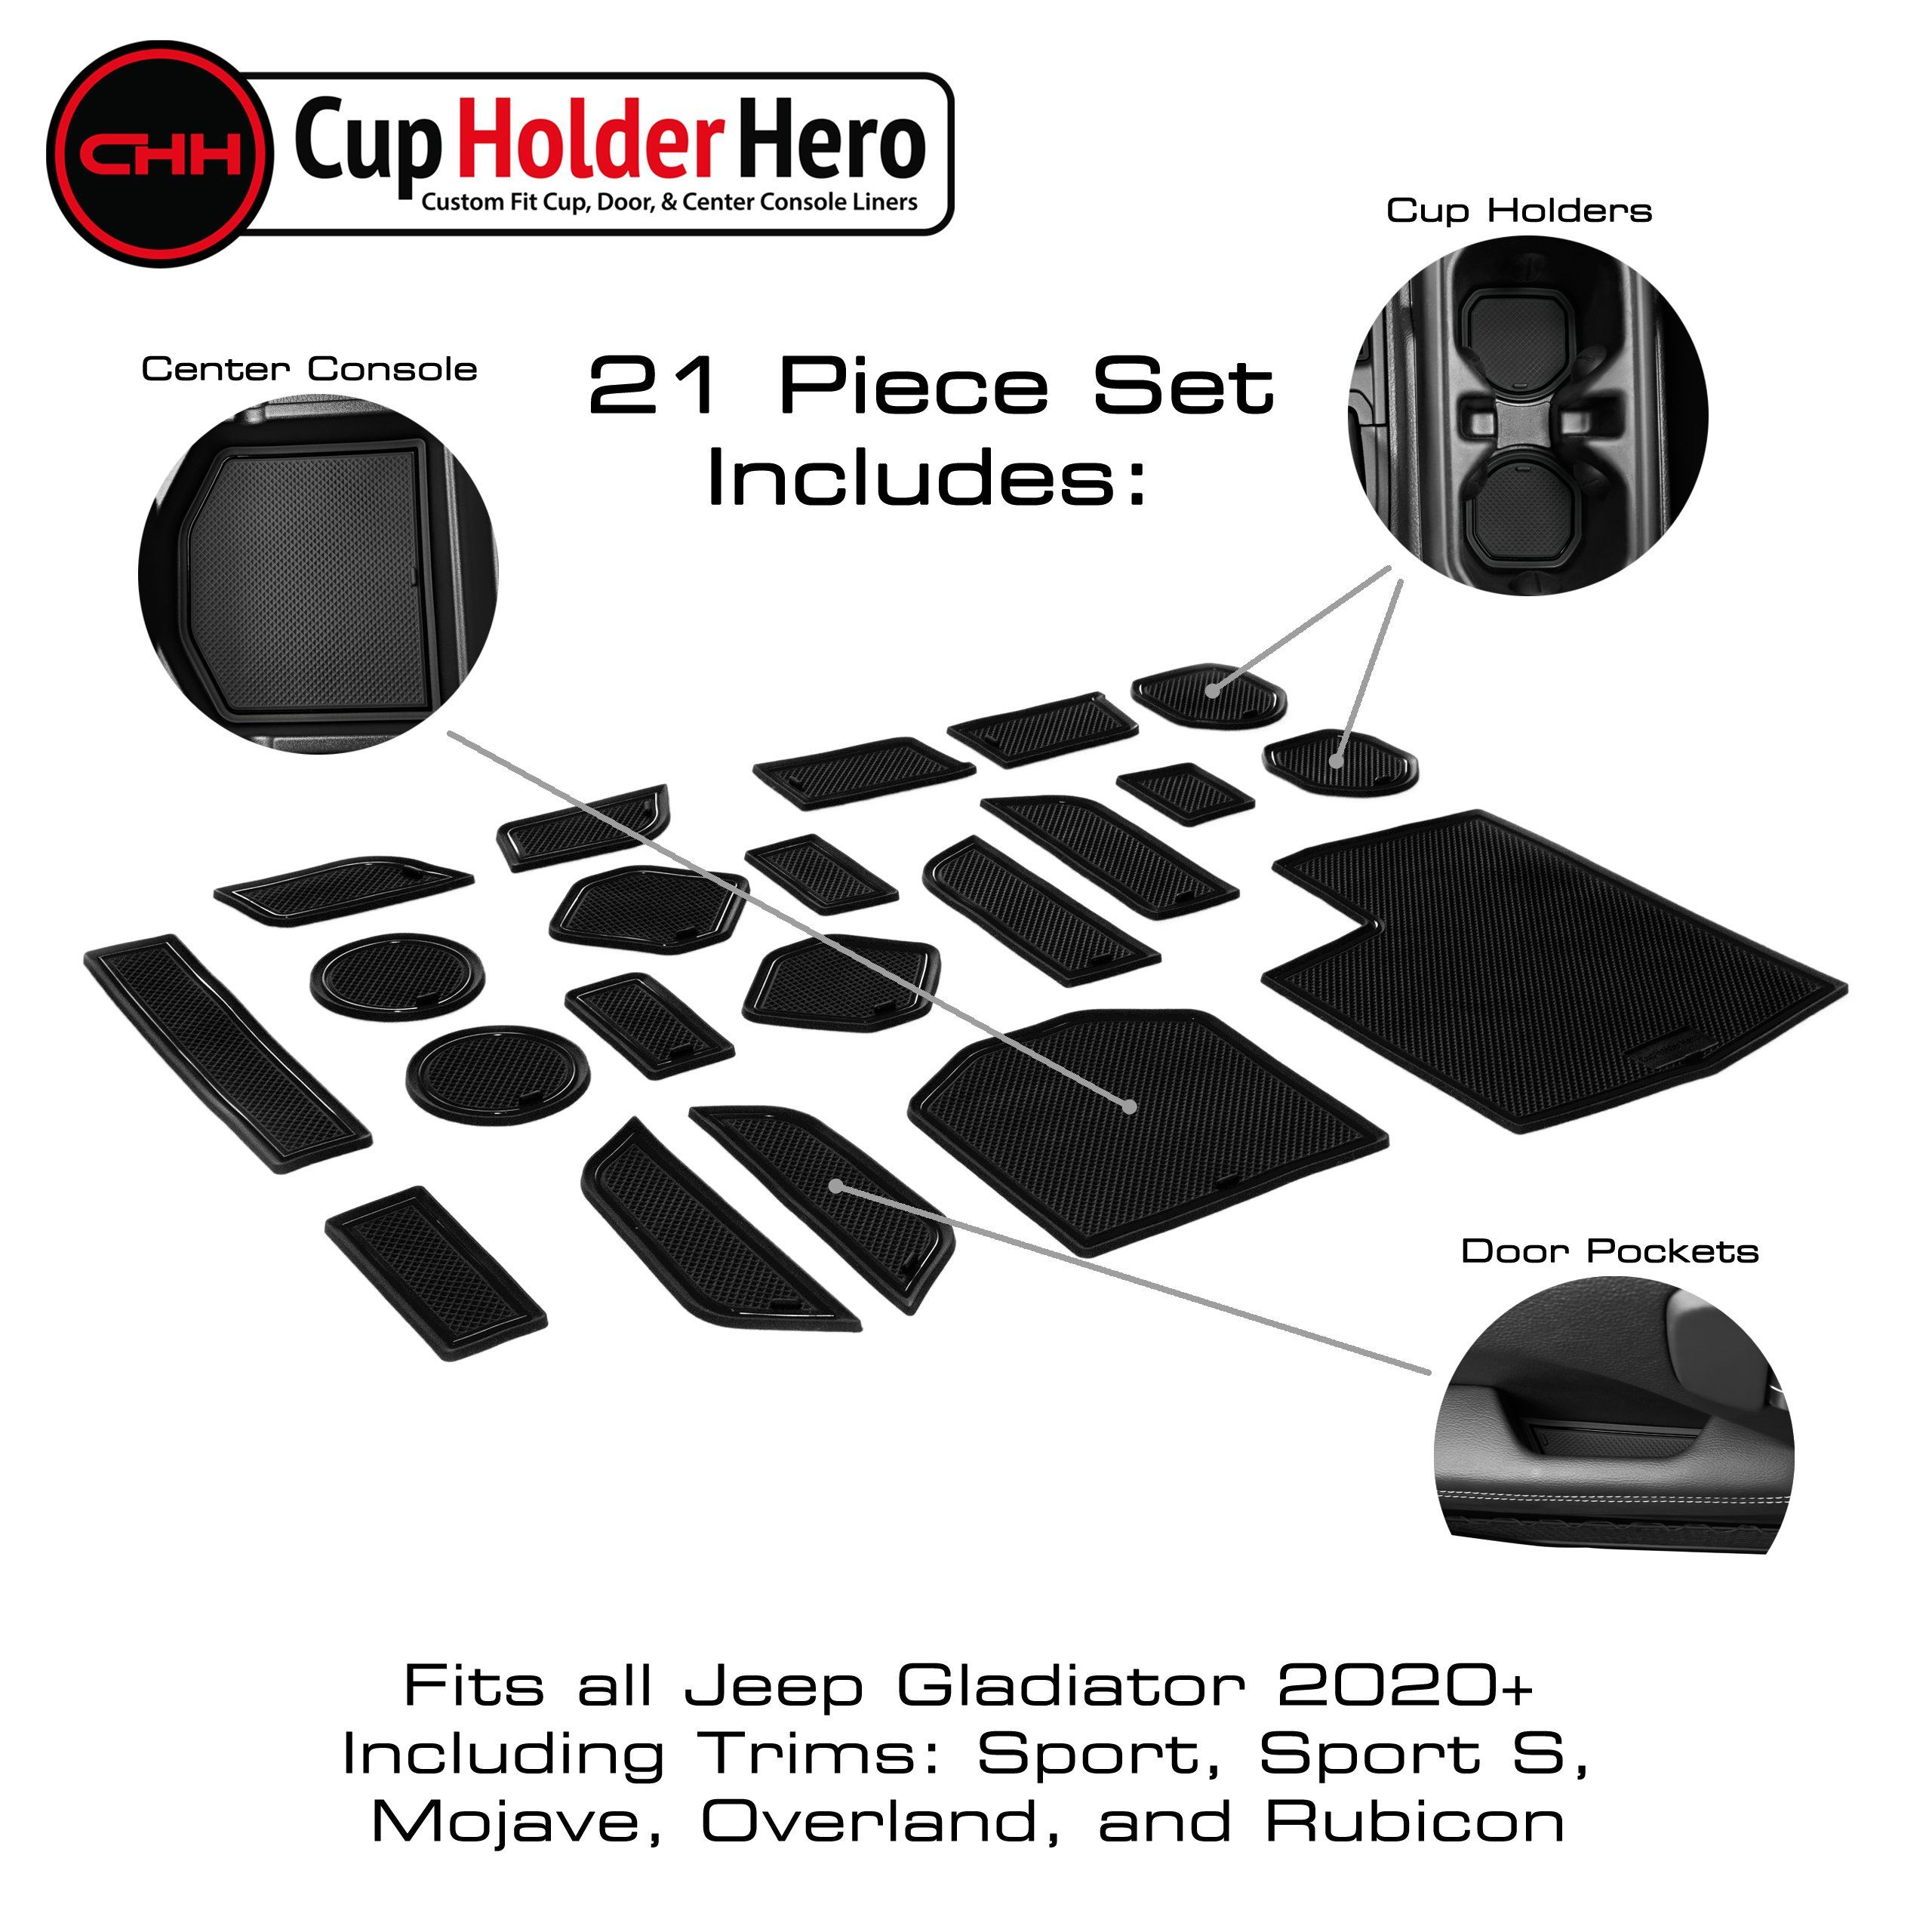 cupholderhero jeep gladiator 2020-2021 liner accessories